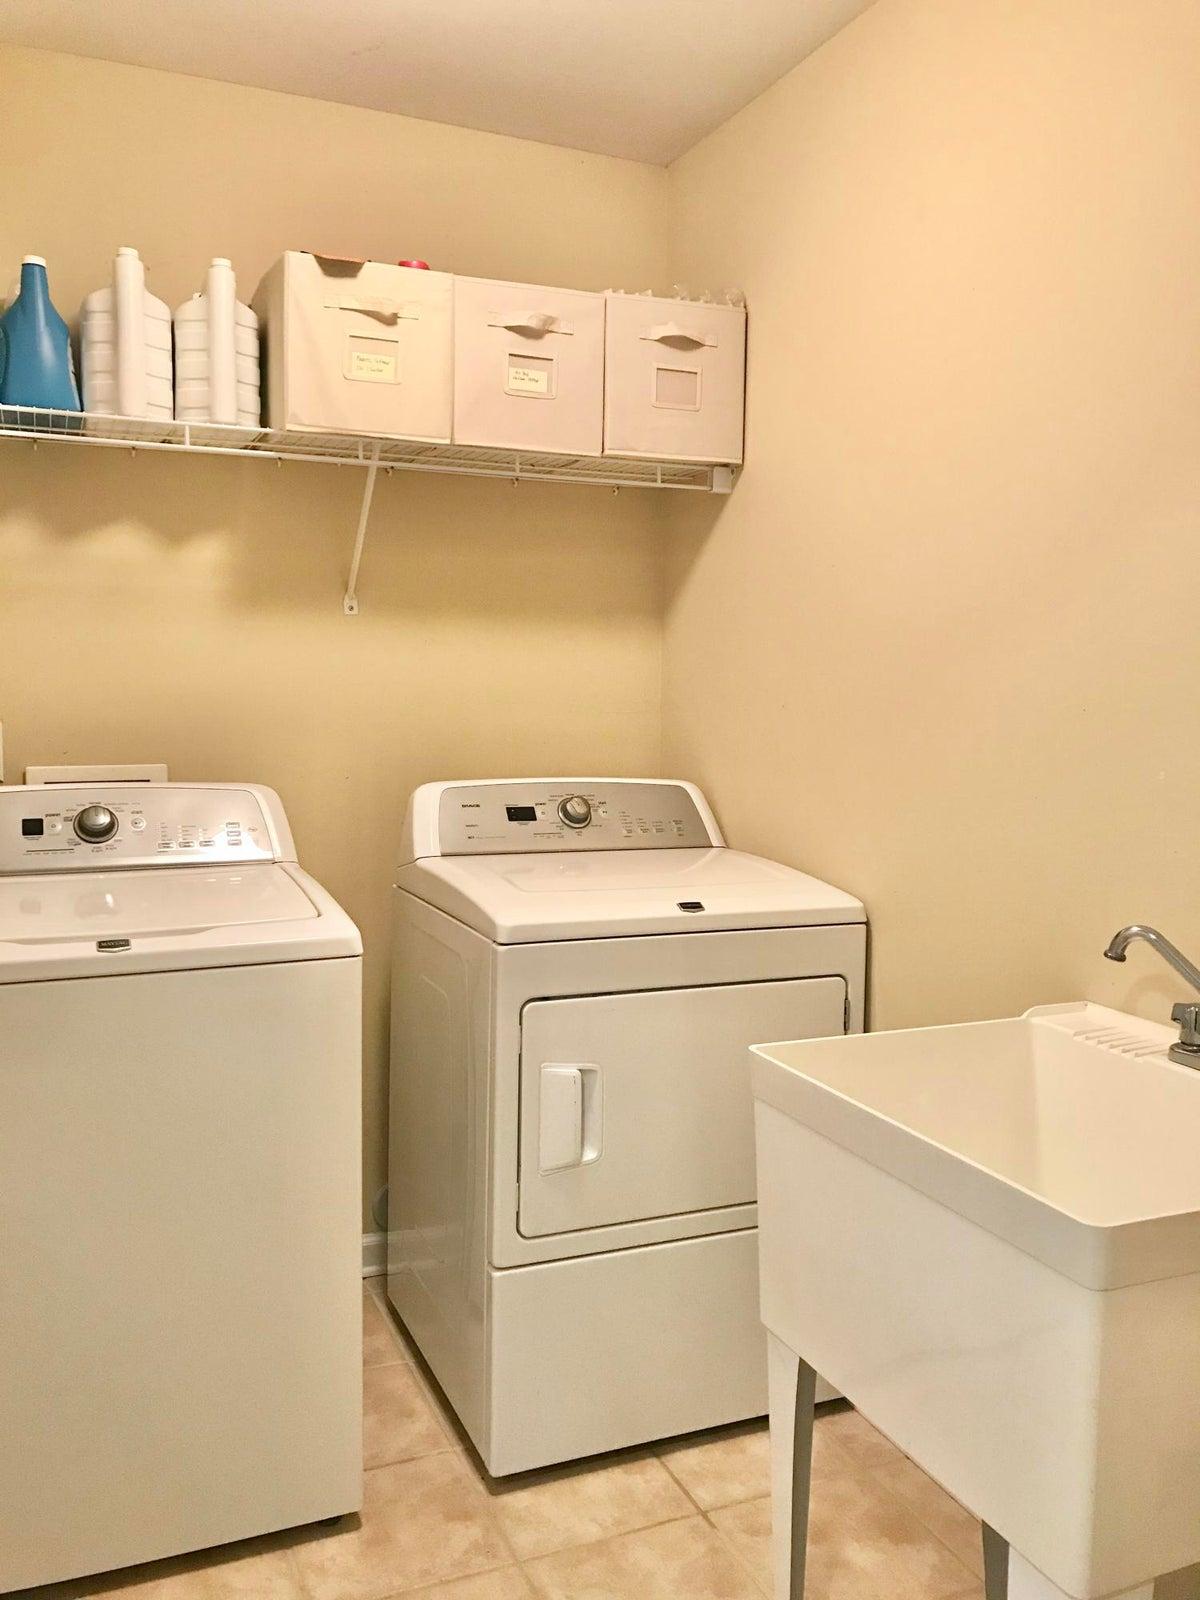 Laundry-Washer /Dryer stays